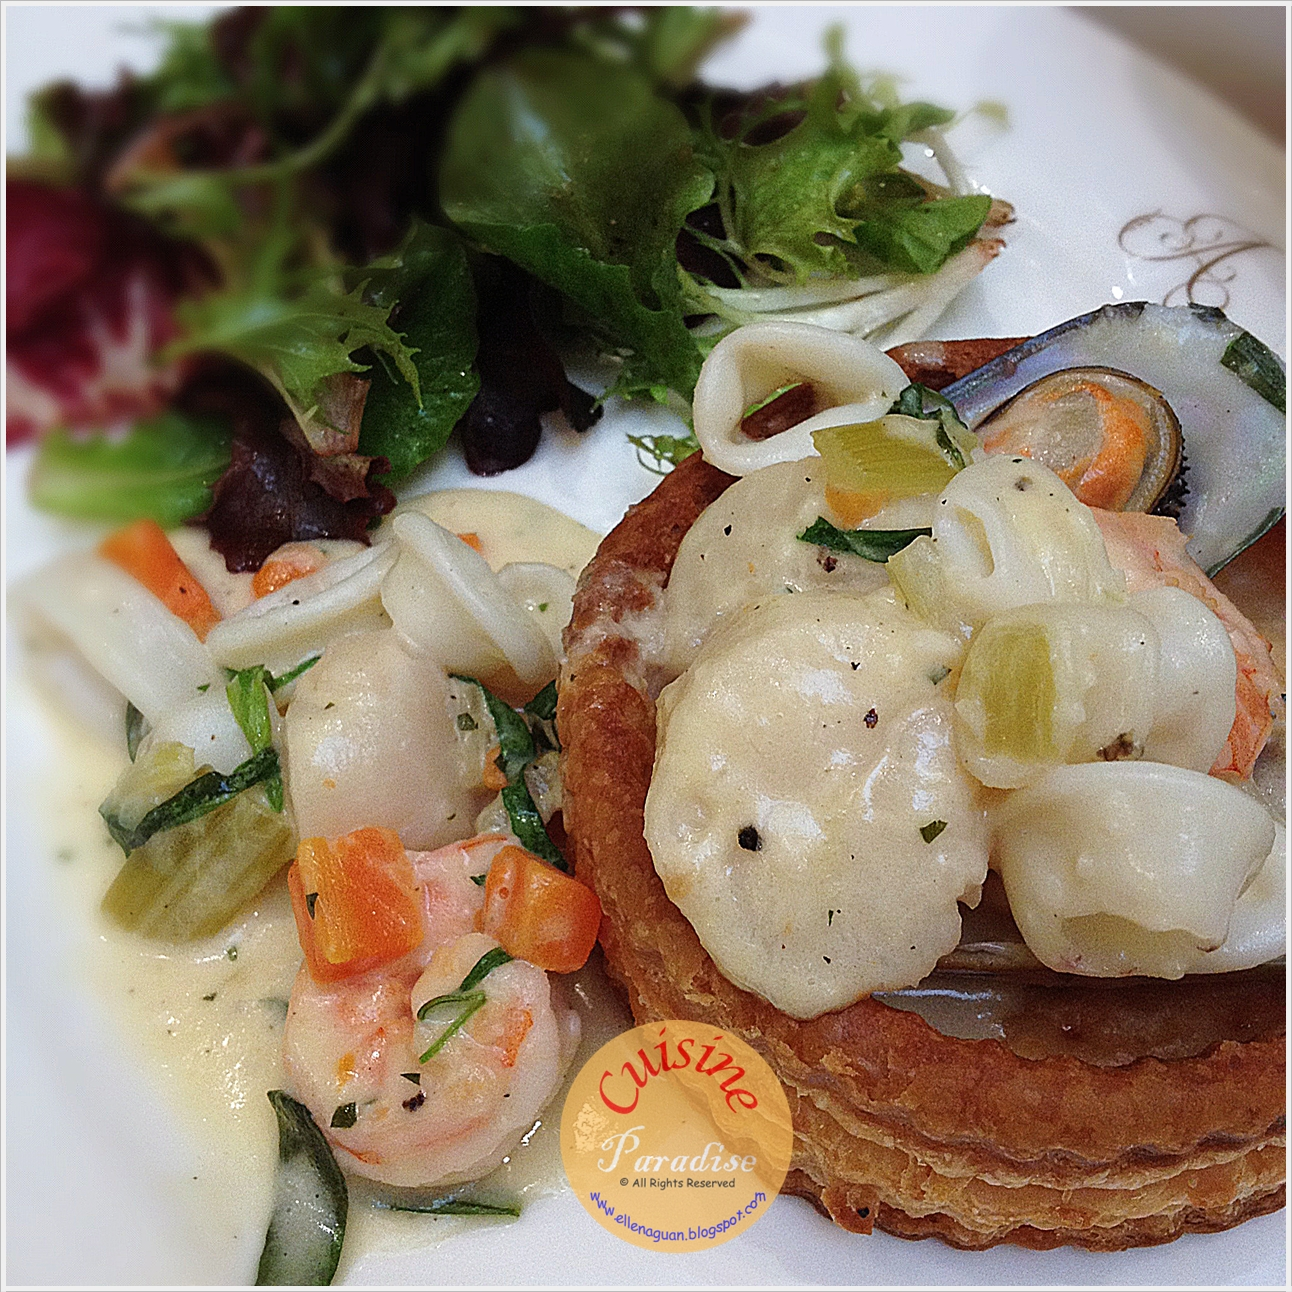 Cuisine paradise singapore food blog recipes reviews and travel antoinette at palais renaissance forumfinder Image collections